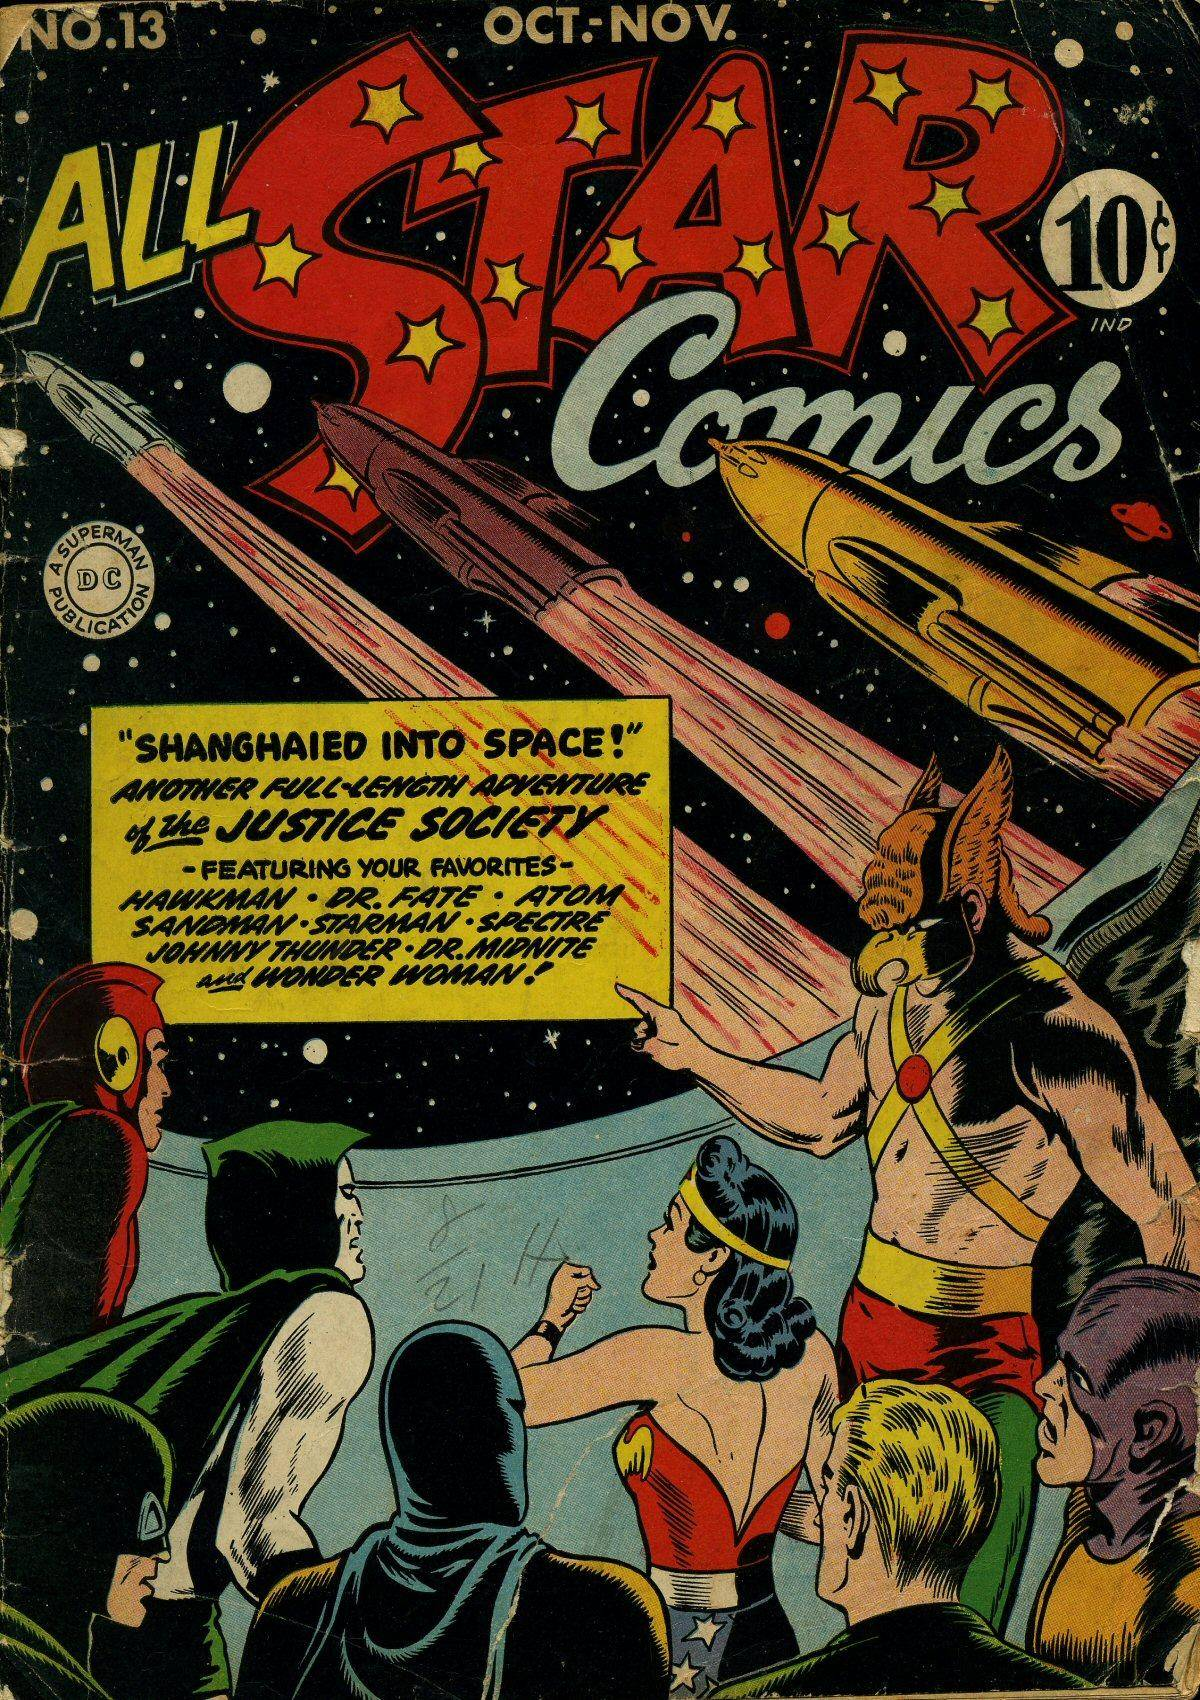 All-Star Comics 013 1942